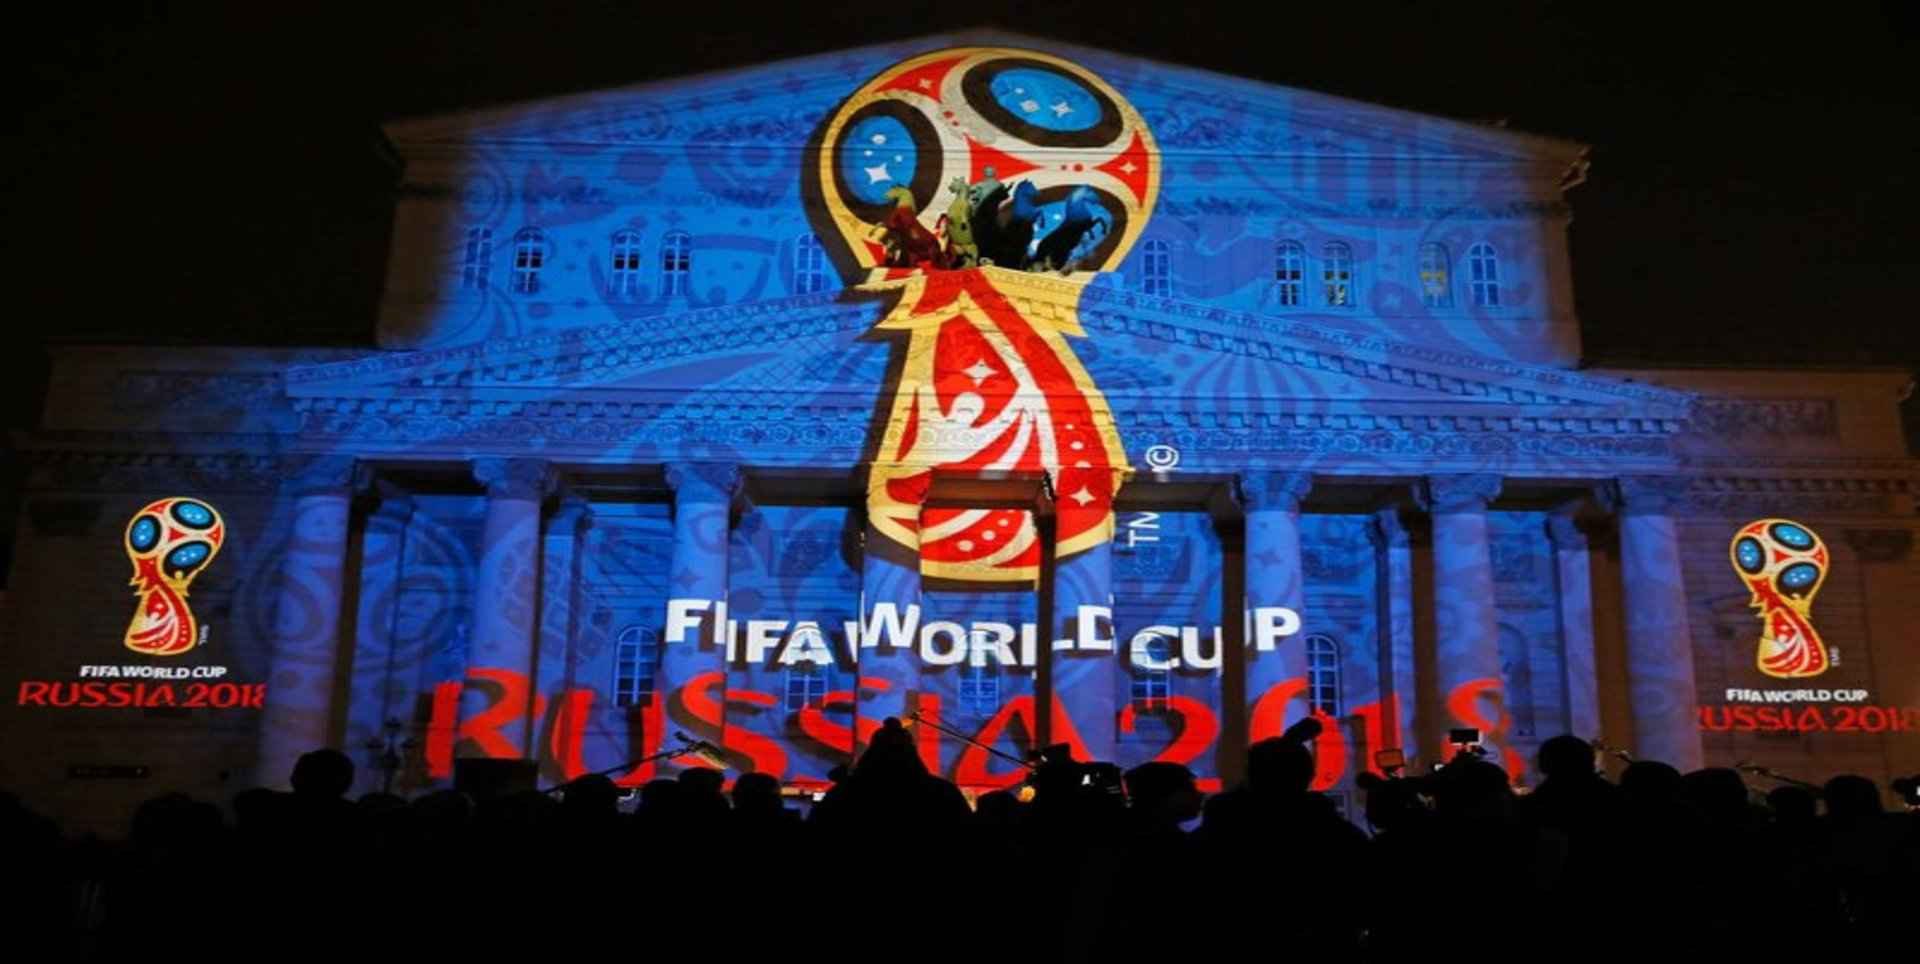 FIFA WC Trinidad and Tobago V United States Live